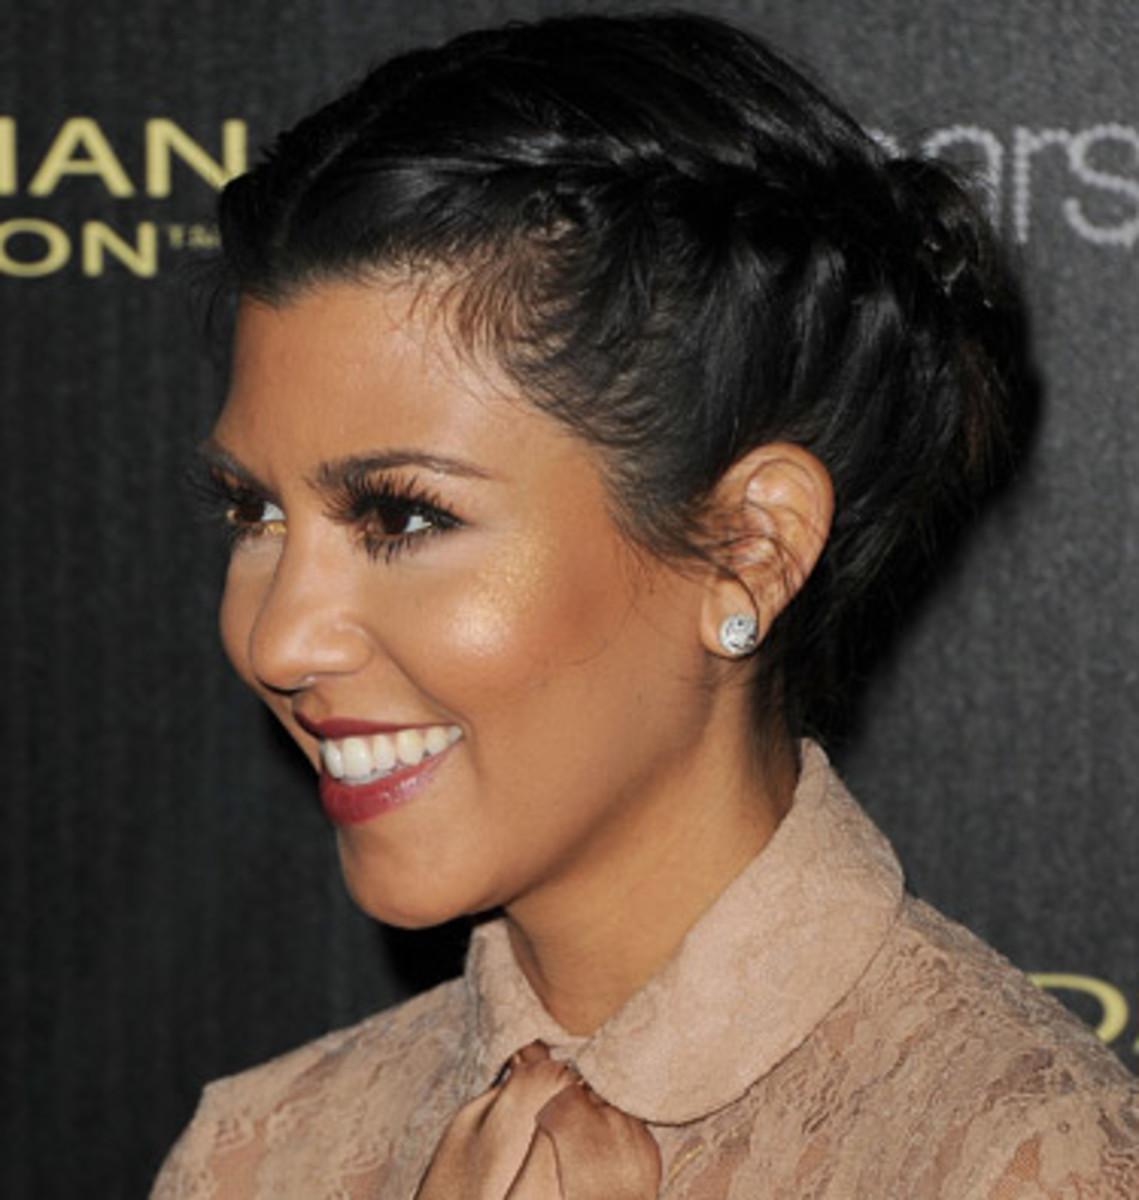 Kourtney Kardashian - Top 10 Celebrity Fashion Dos and Don'ts